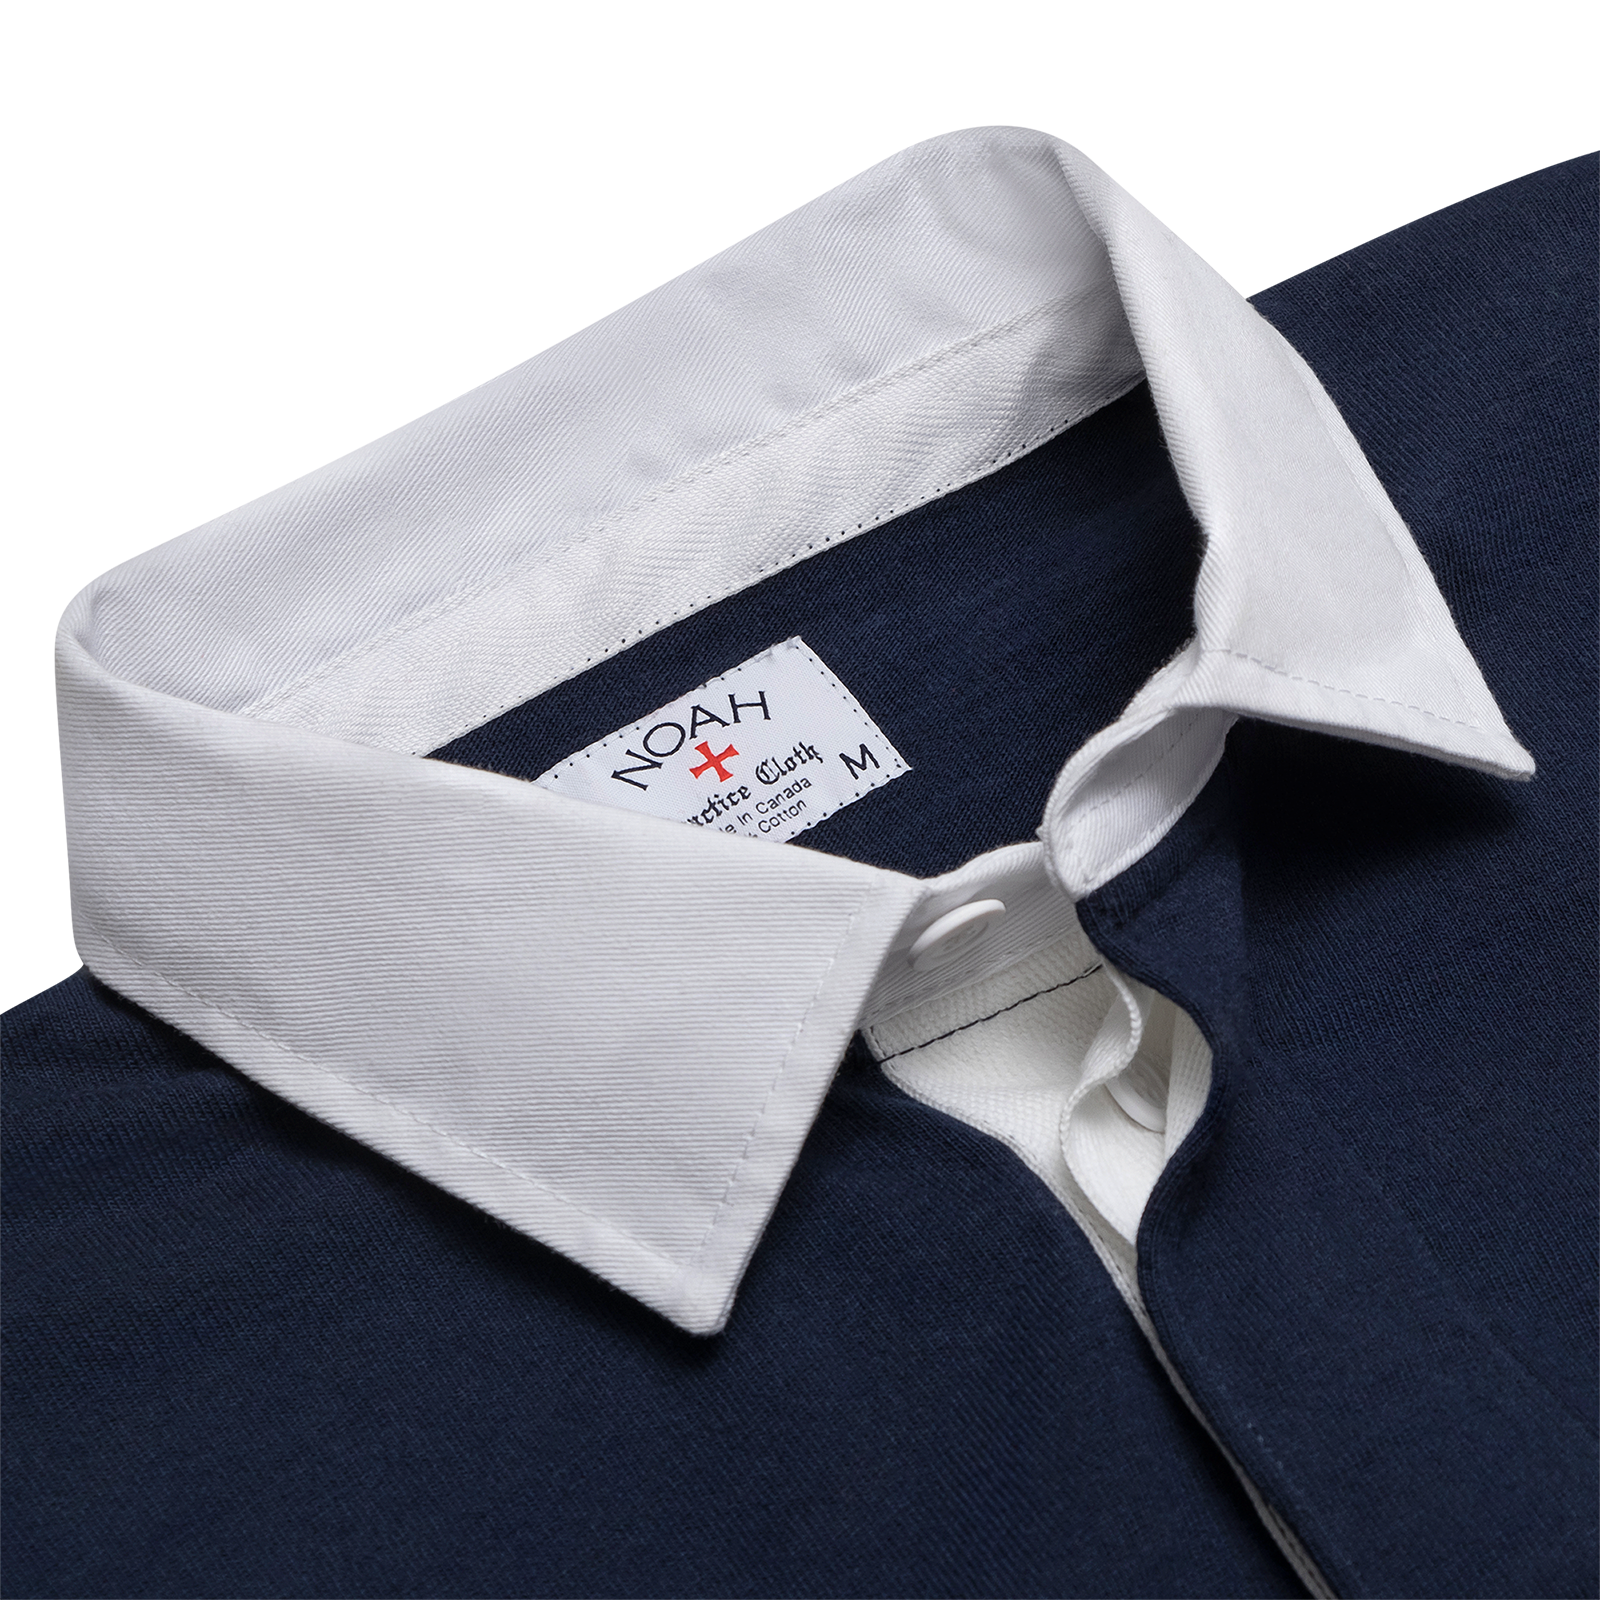 Collar close up product image